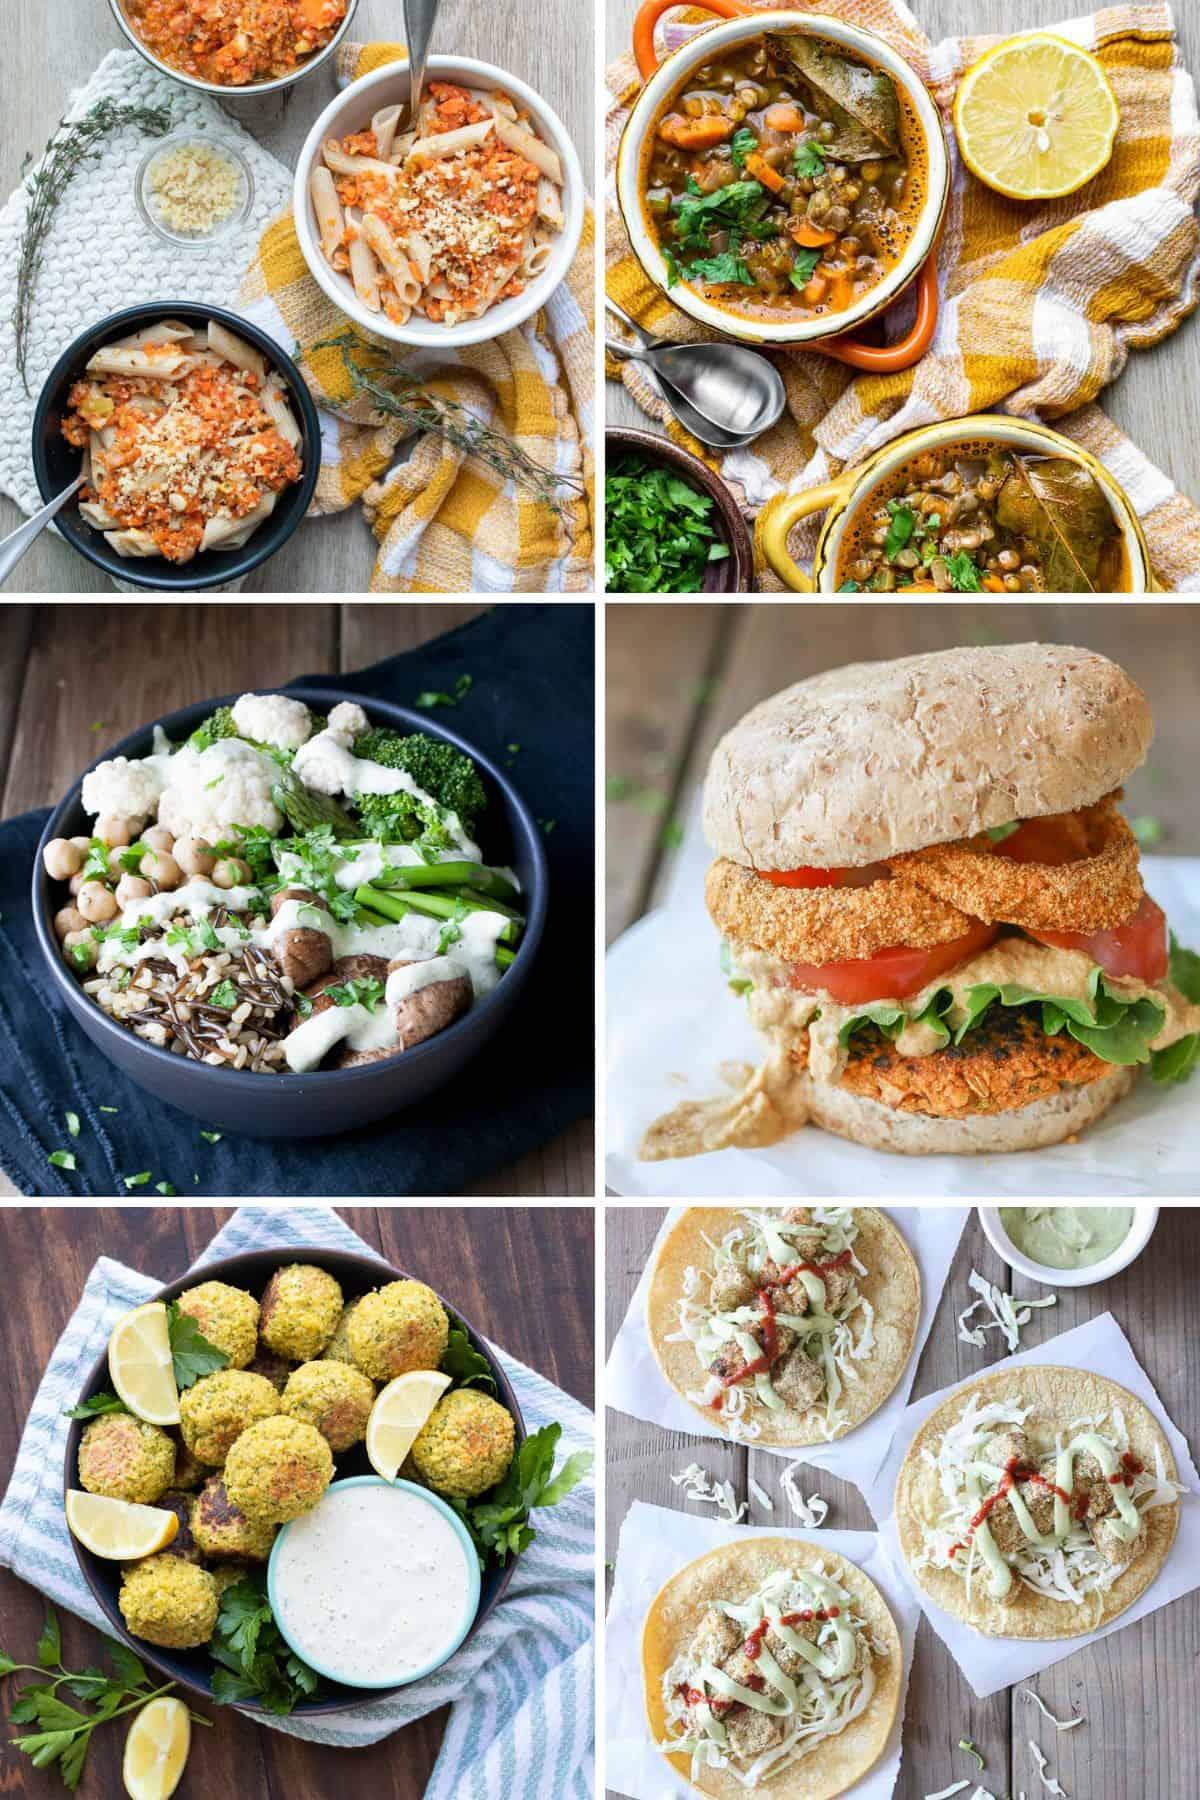 A photo collage of a grain bowl, soup, tacos, falafel, burger and pasta